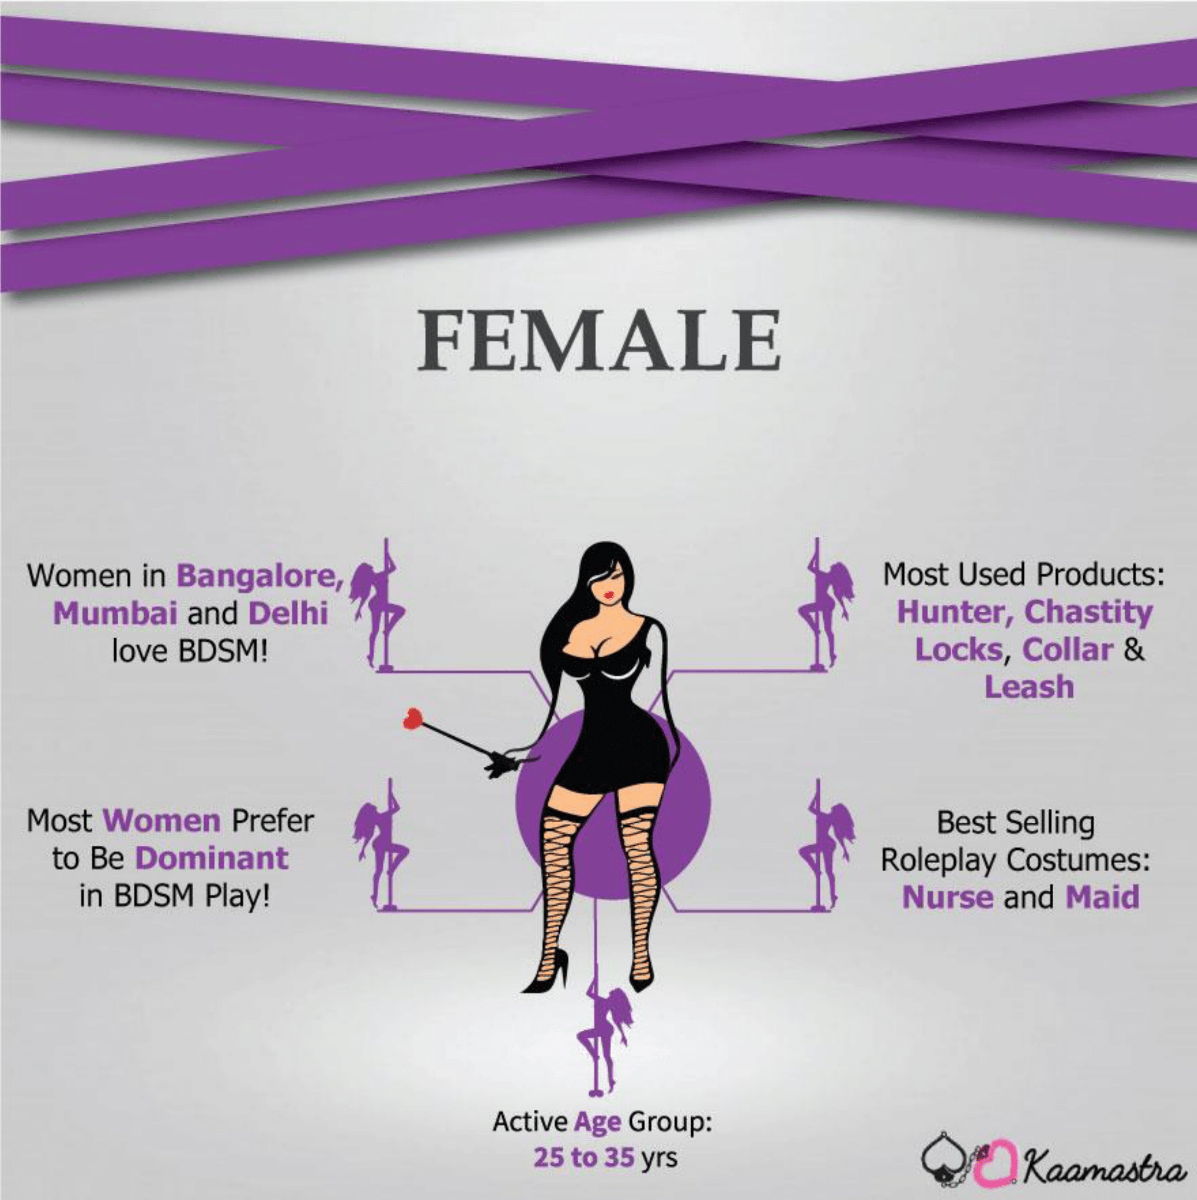 Female BDSM